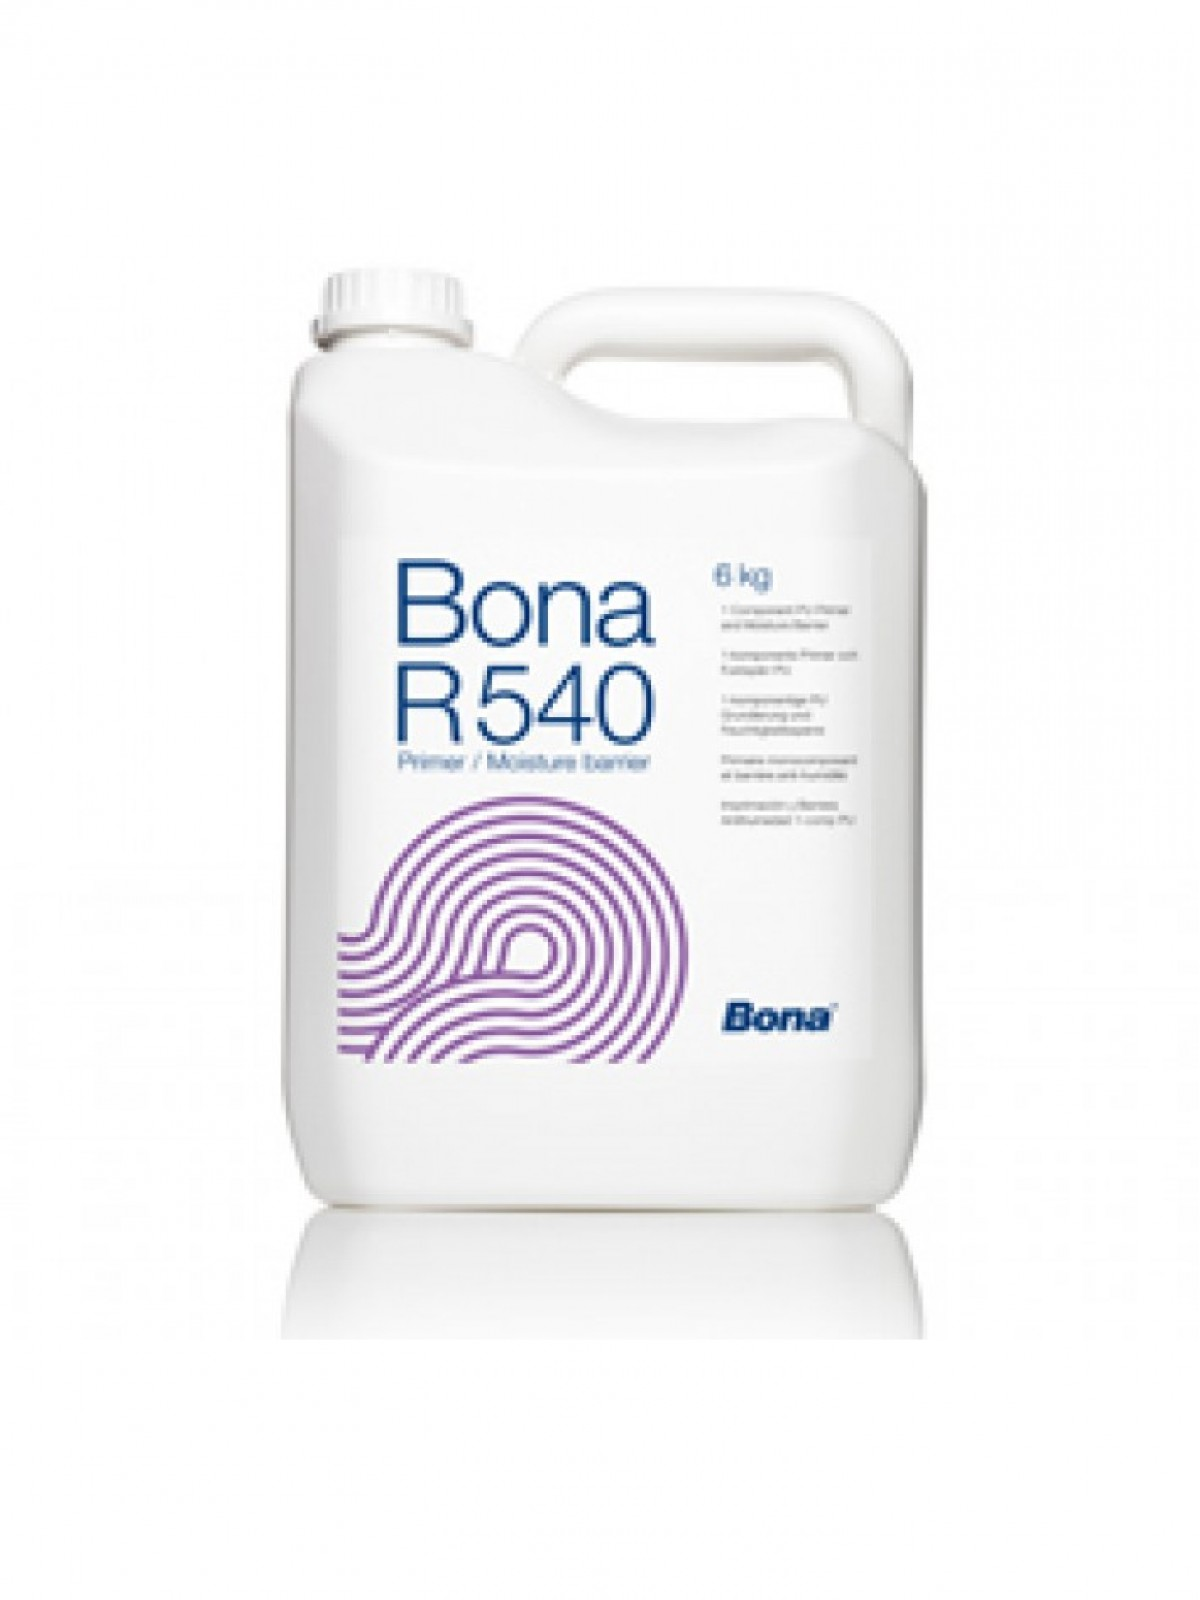 Amorsa poliuretanica Bona R540